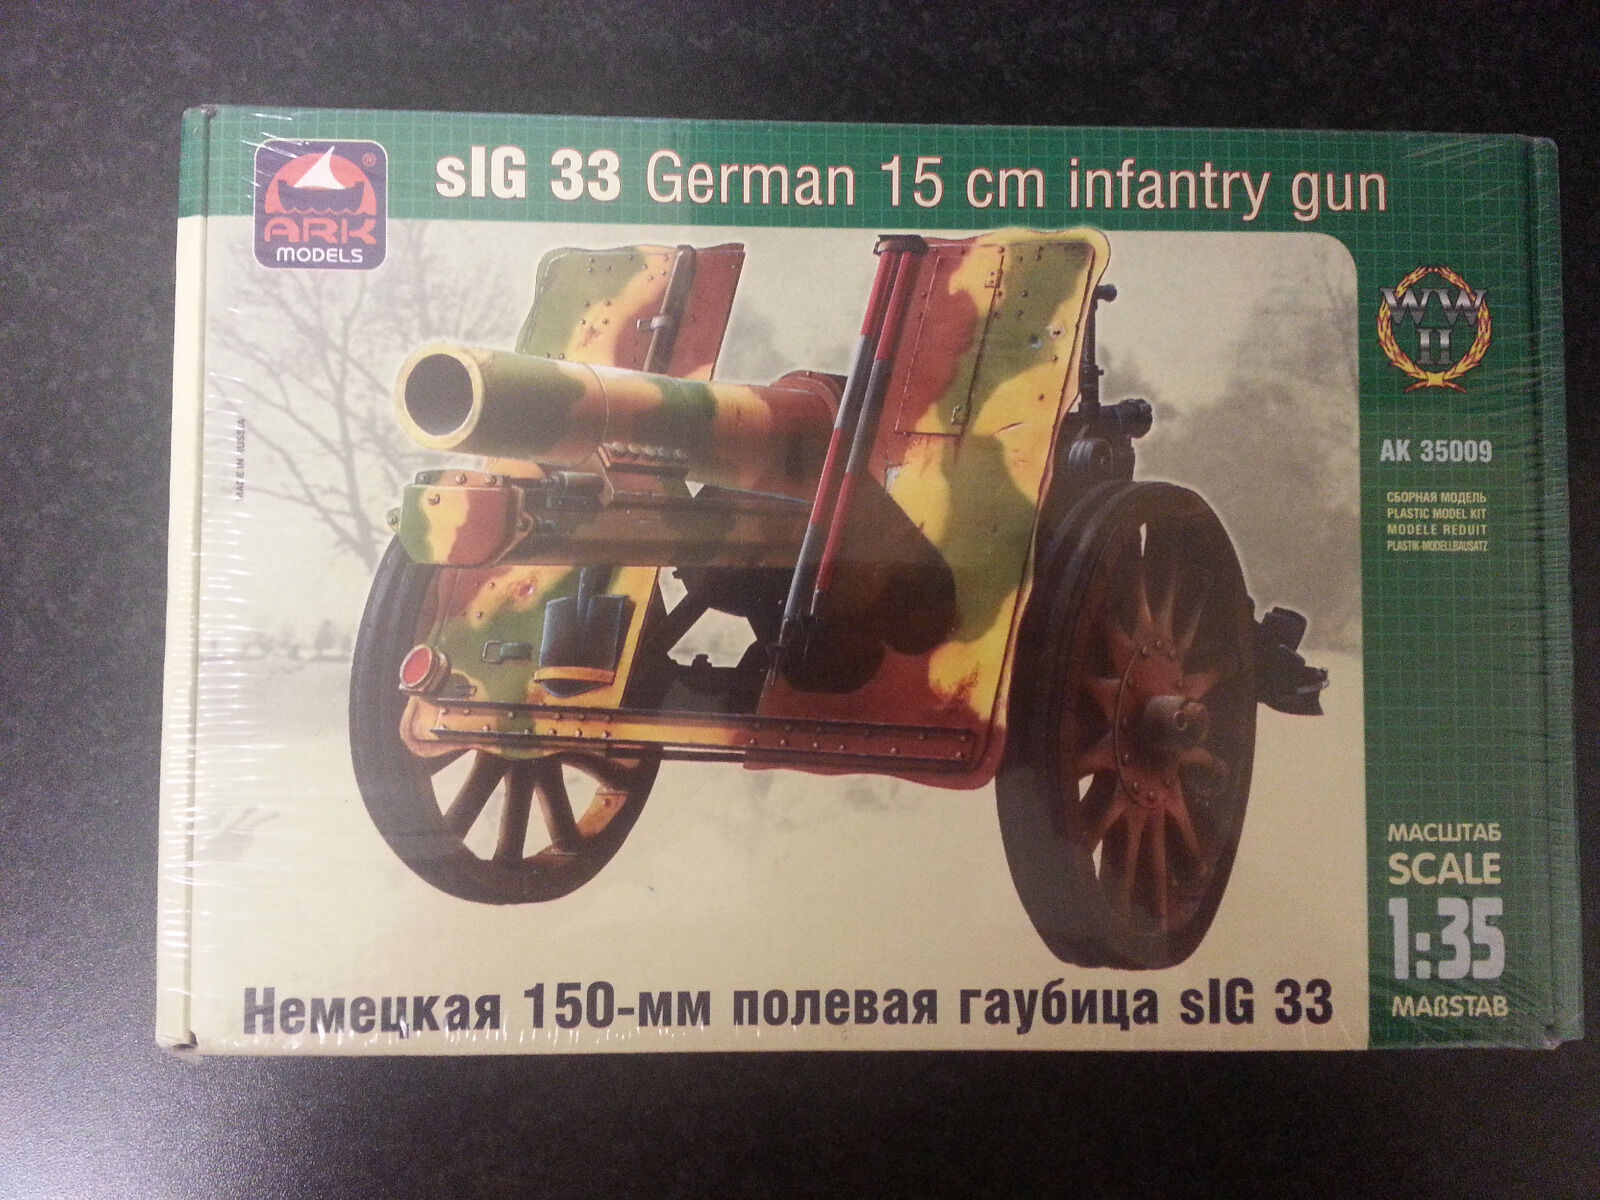 ARK MODELS 35009 SIG 33 GERMAN 15 CM INFANTRY GUN 1 35